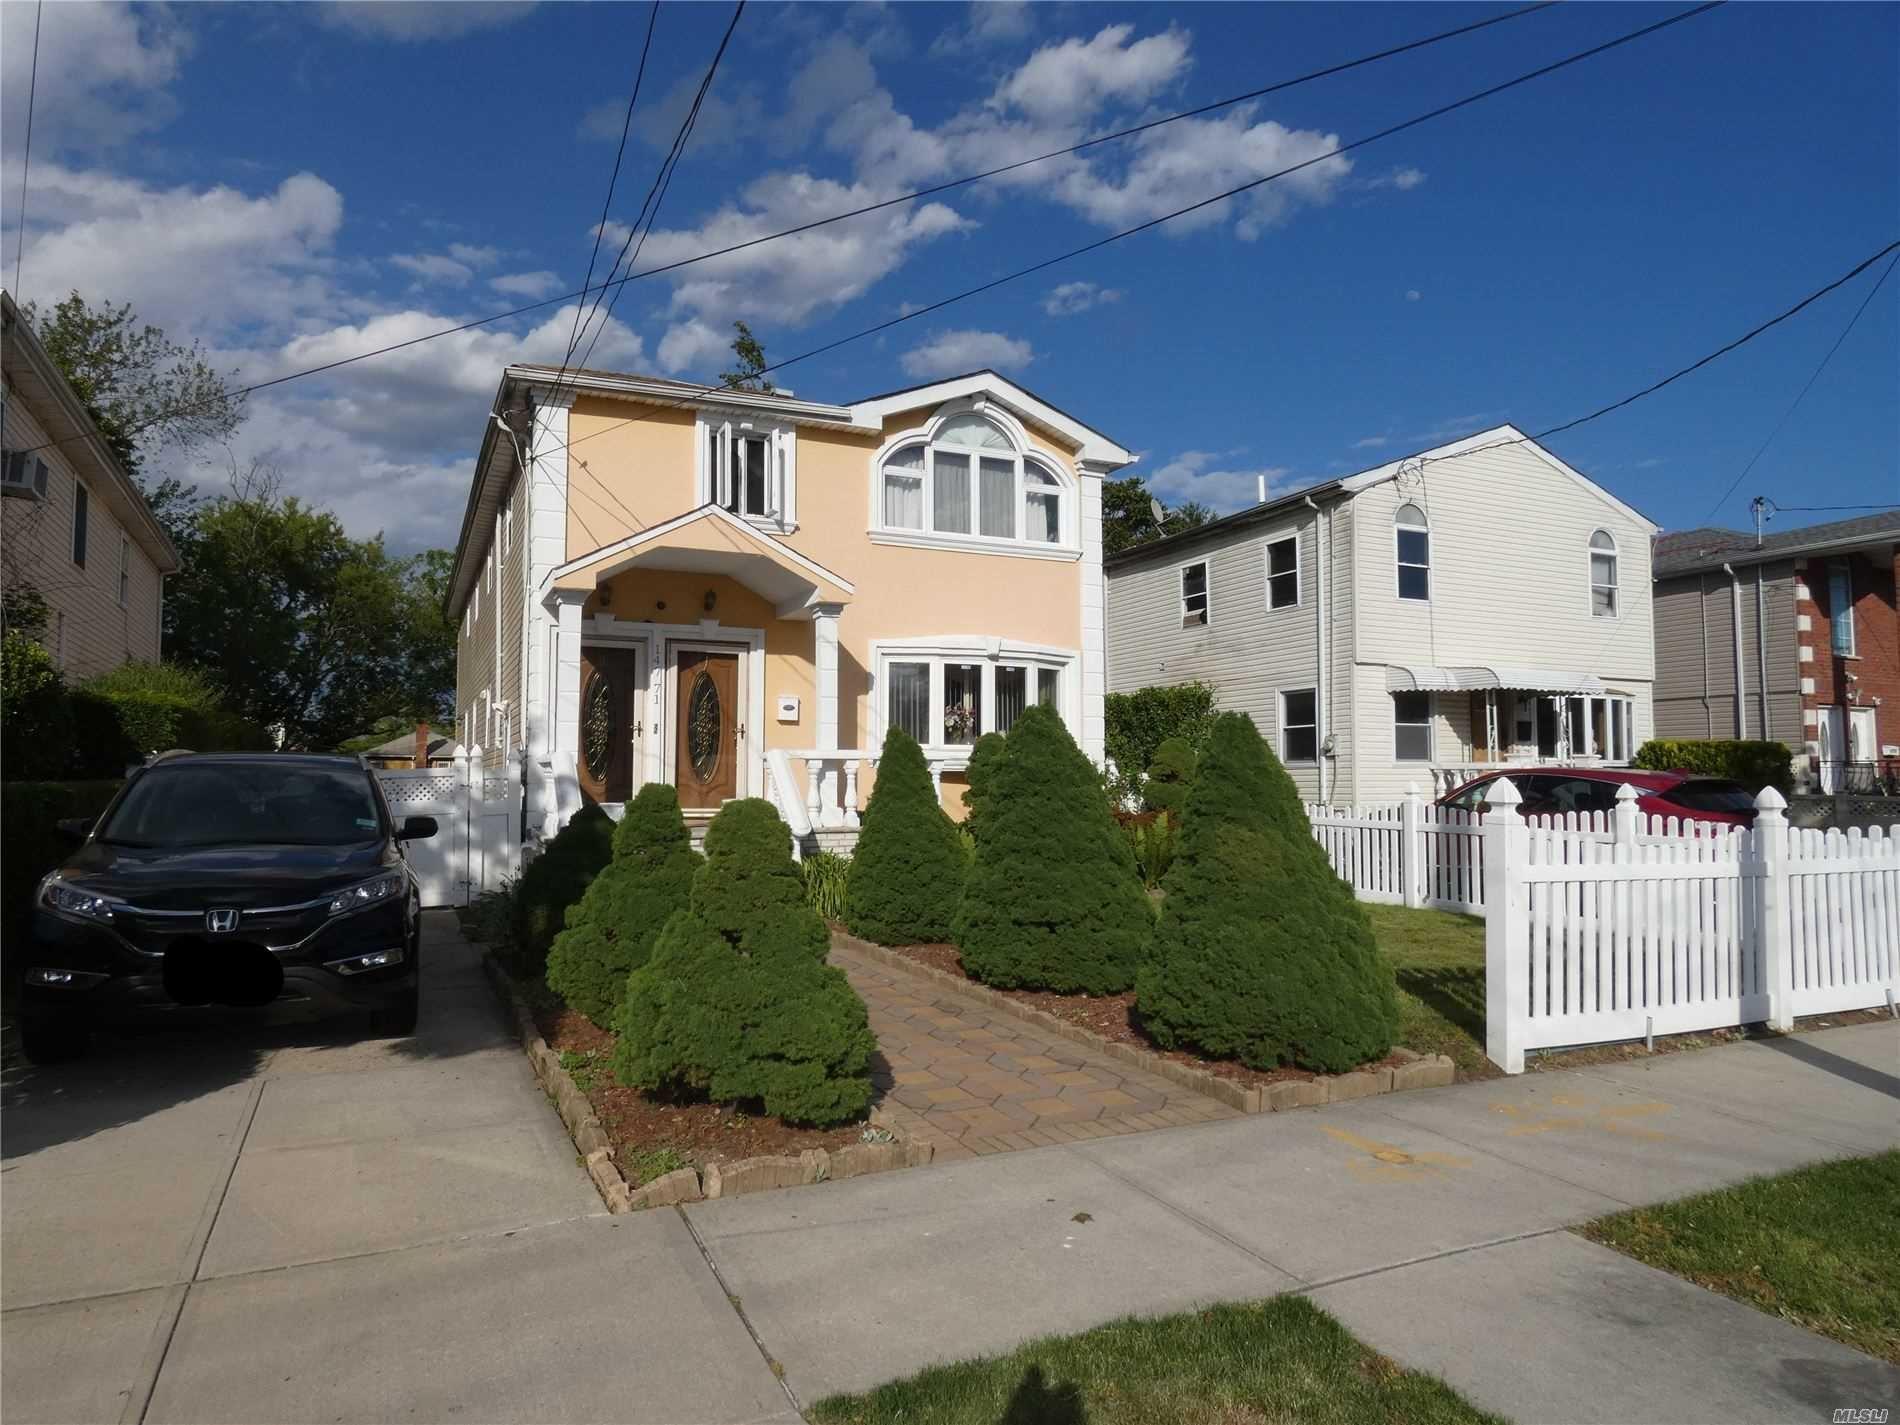 147-71 Edgewood Street, Rosedale, NY 11422 - MLS#: 3219236